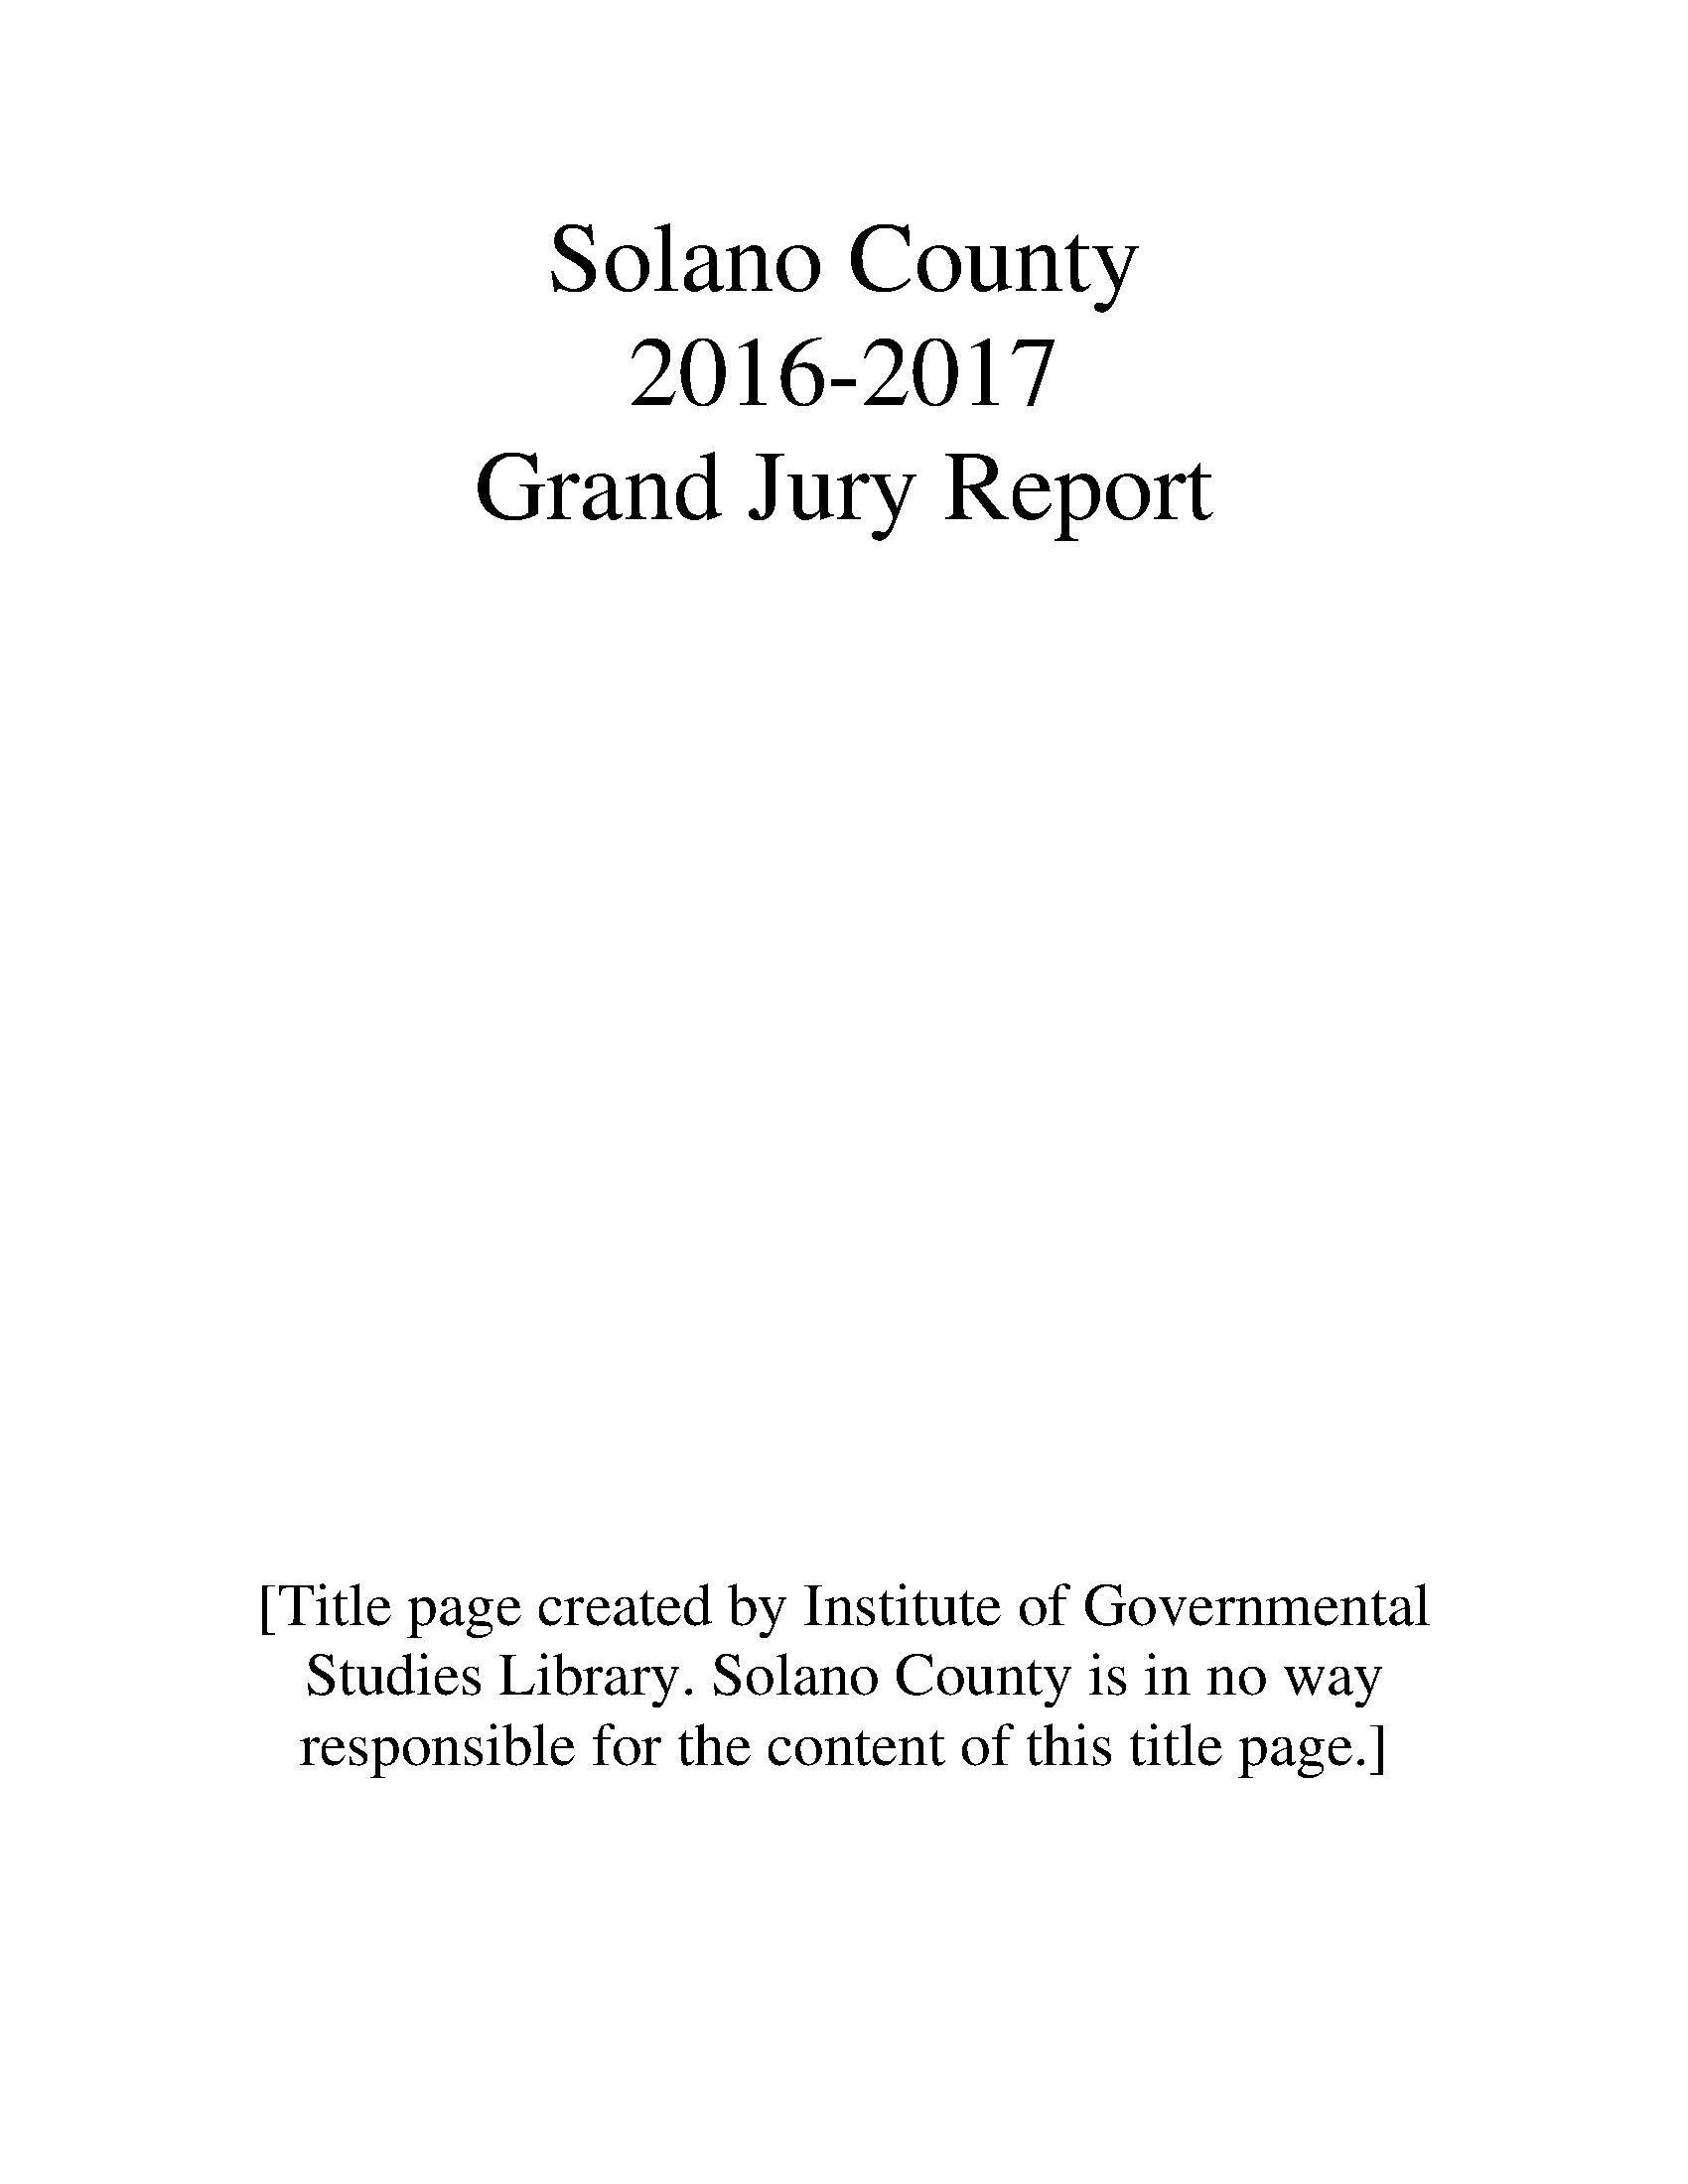 Pasadena Isd Calendar 2019-2016 Grand Jury reports and responses   California Grand Jury Reports